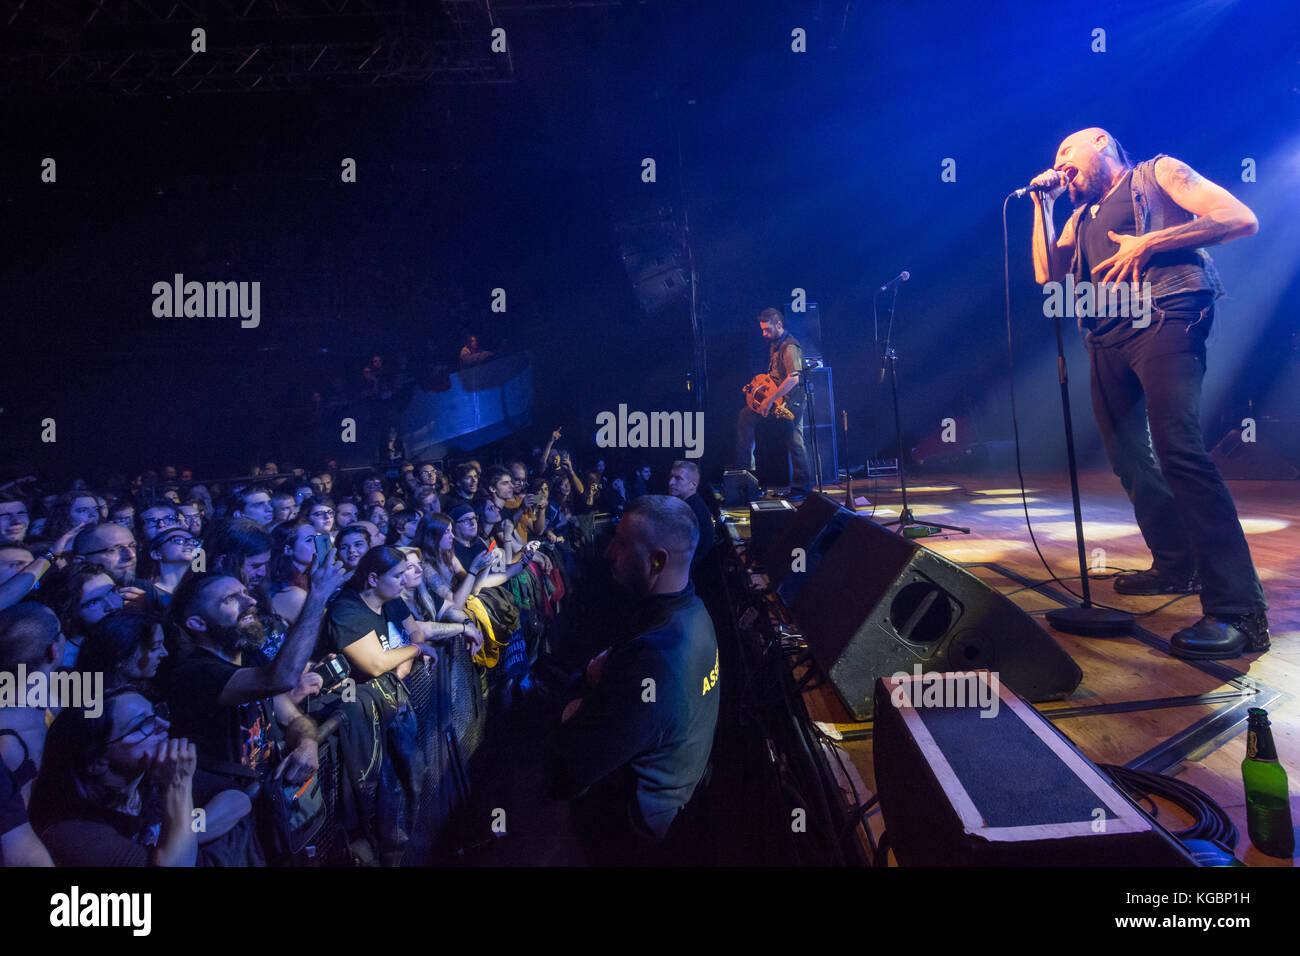 Milan, Italy. 4st November 2017. Italian folk rock band Folkstone performs at Live Music Club. Credit: Simone Brambilla/Alamy Stock Photo